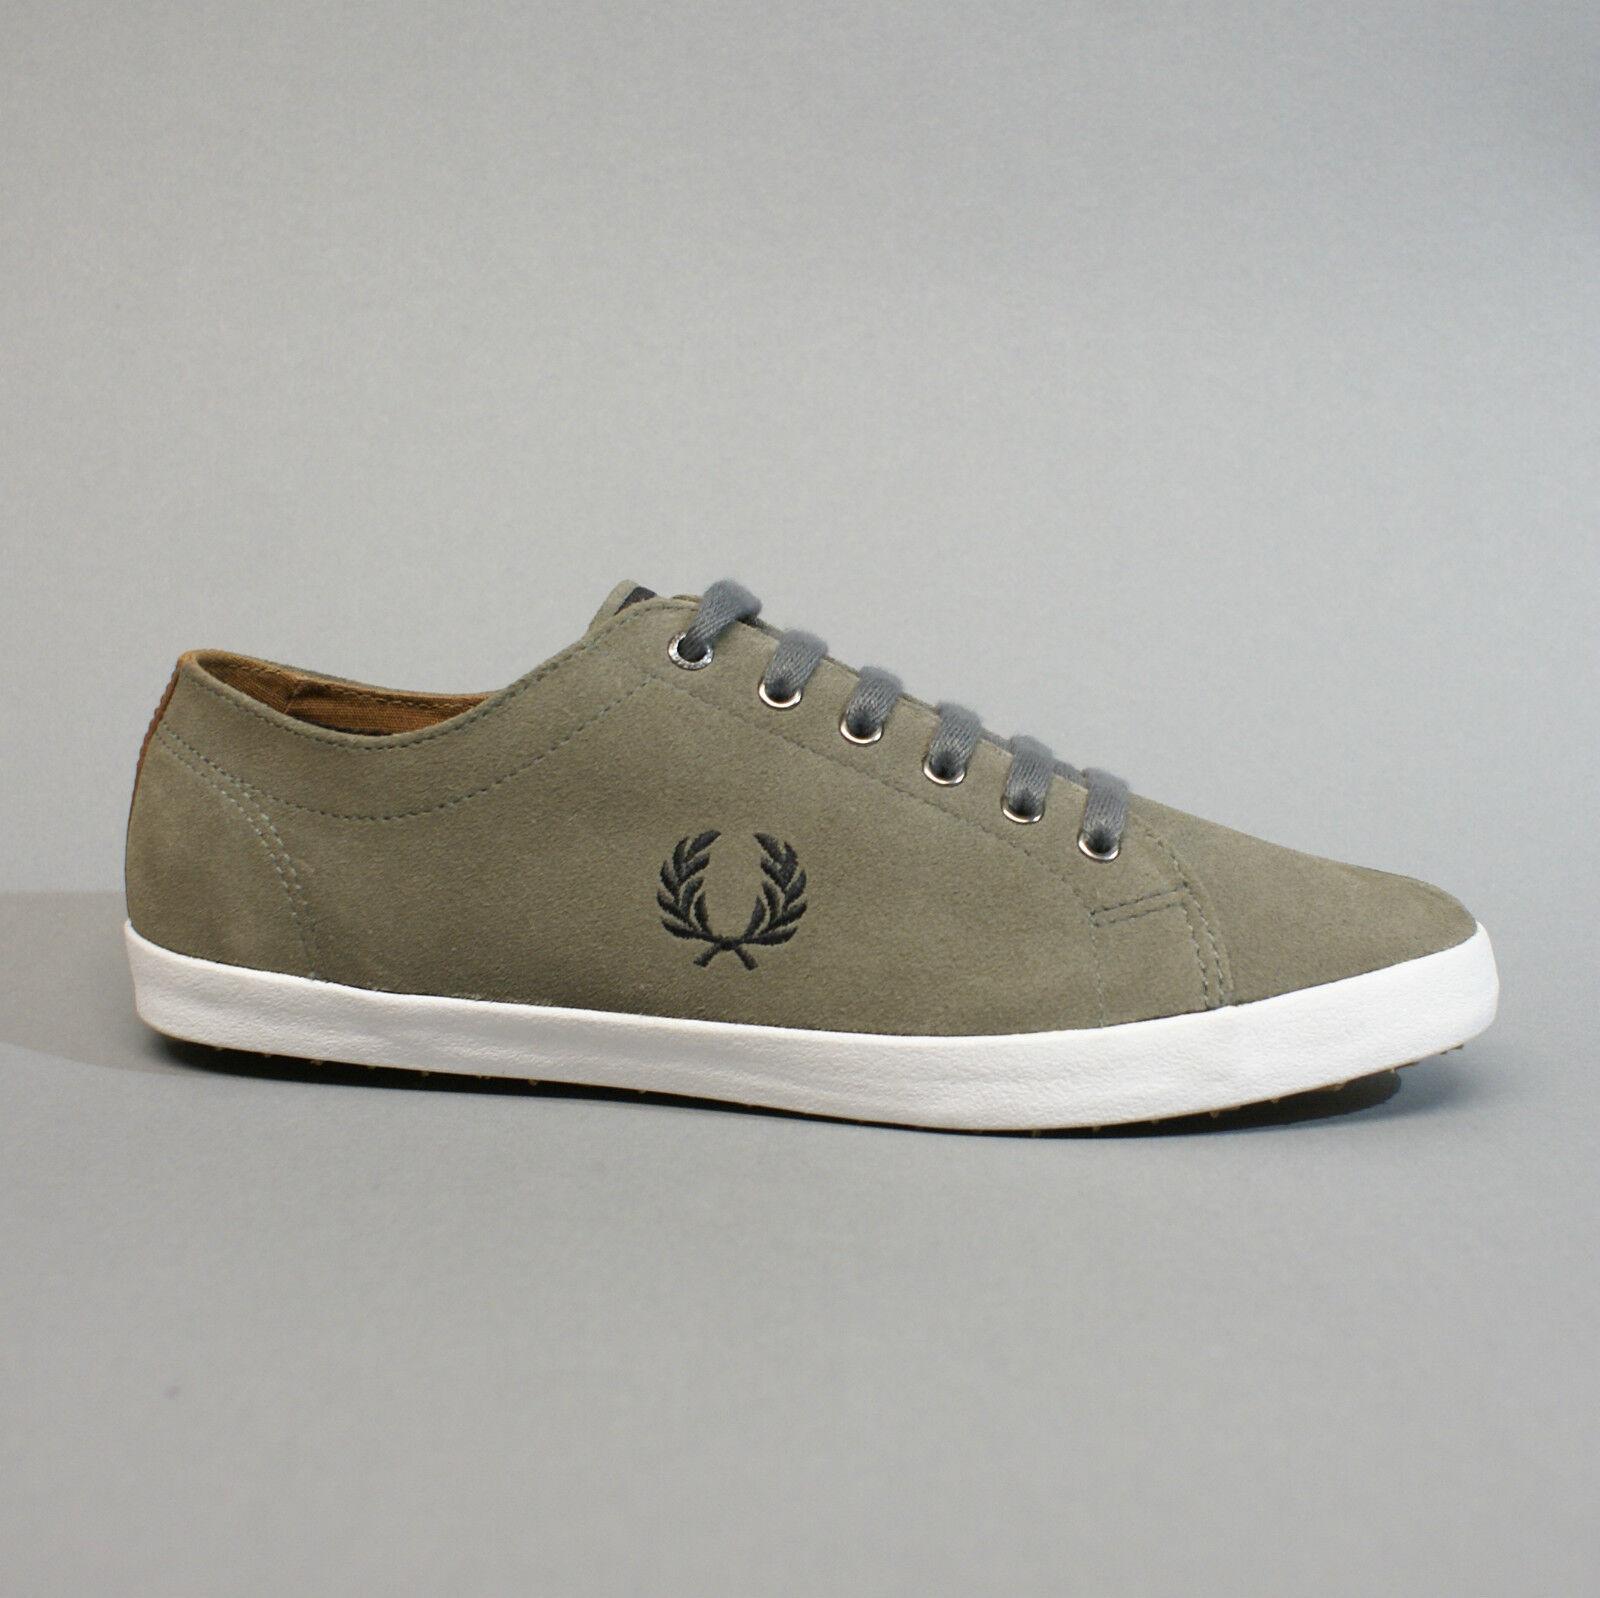 Fred Perry Kingston Suede Mid Grey B6238-614 Turnschuhe Sneakers grau Wildleder